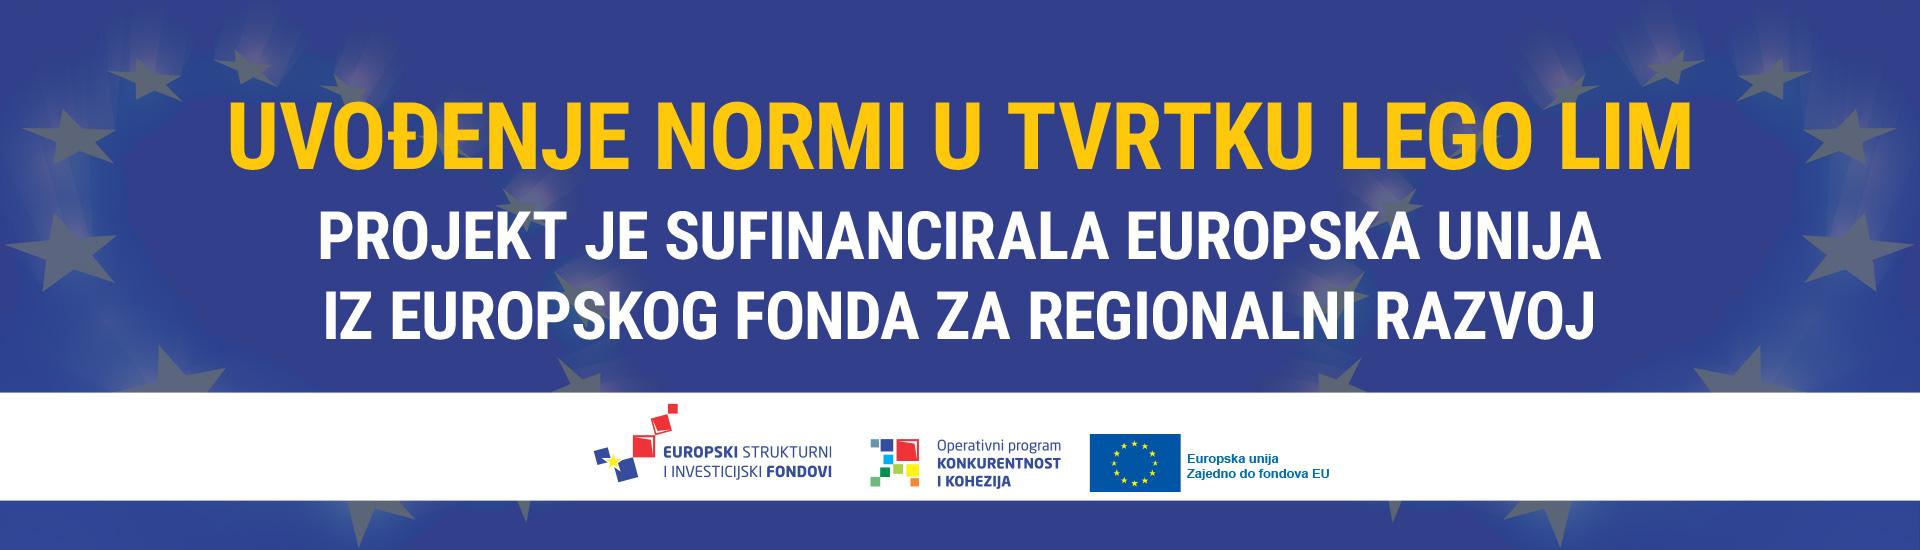 http://www.legolim.hr/Repository/Banners/largeBanners-europski-strukturni-investicijski-fondovi-122018.jpg